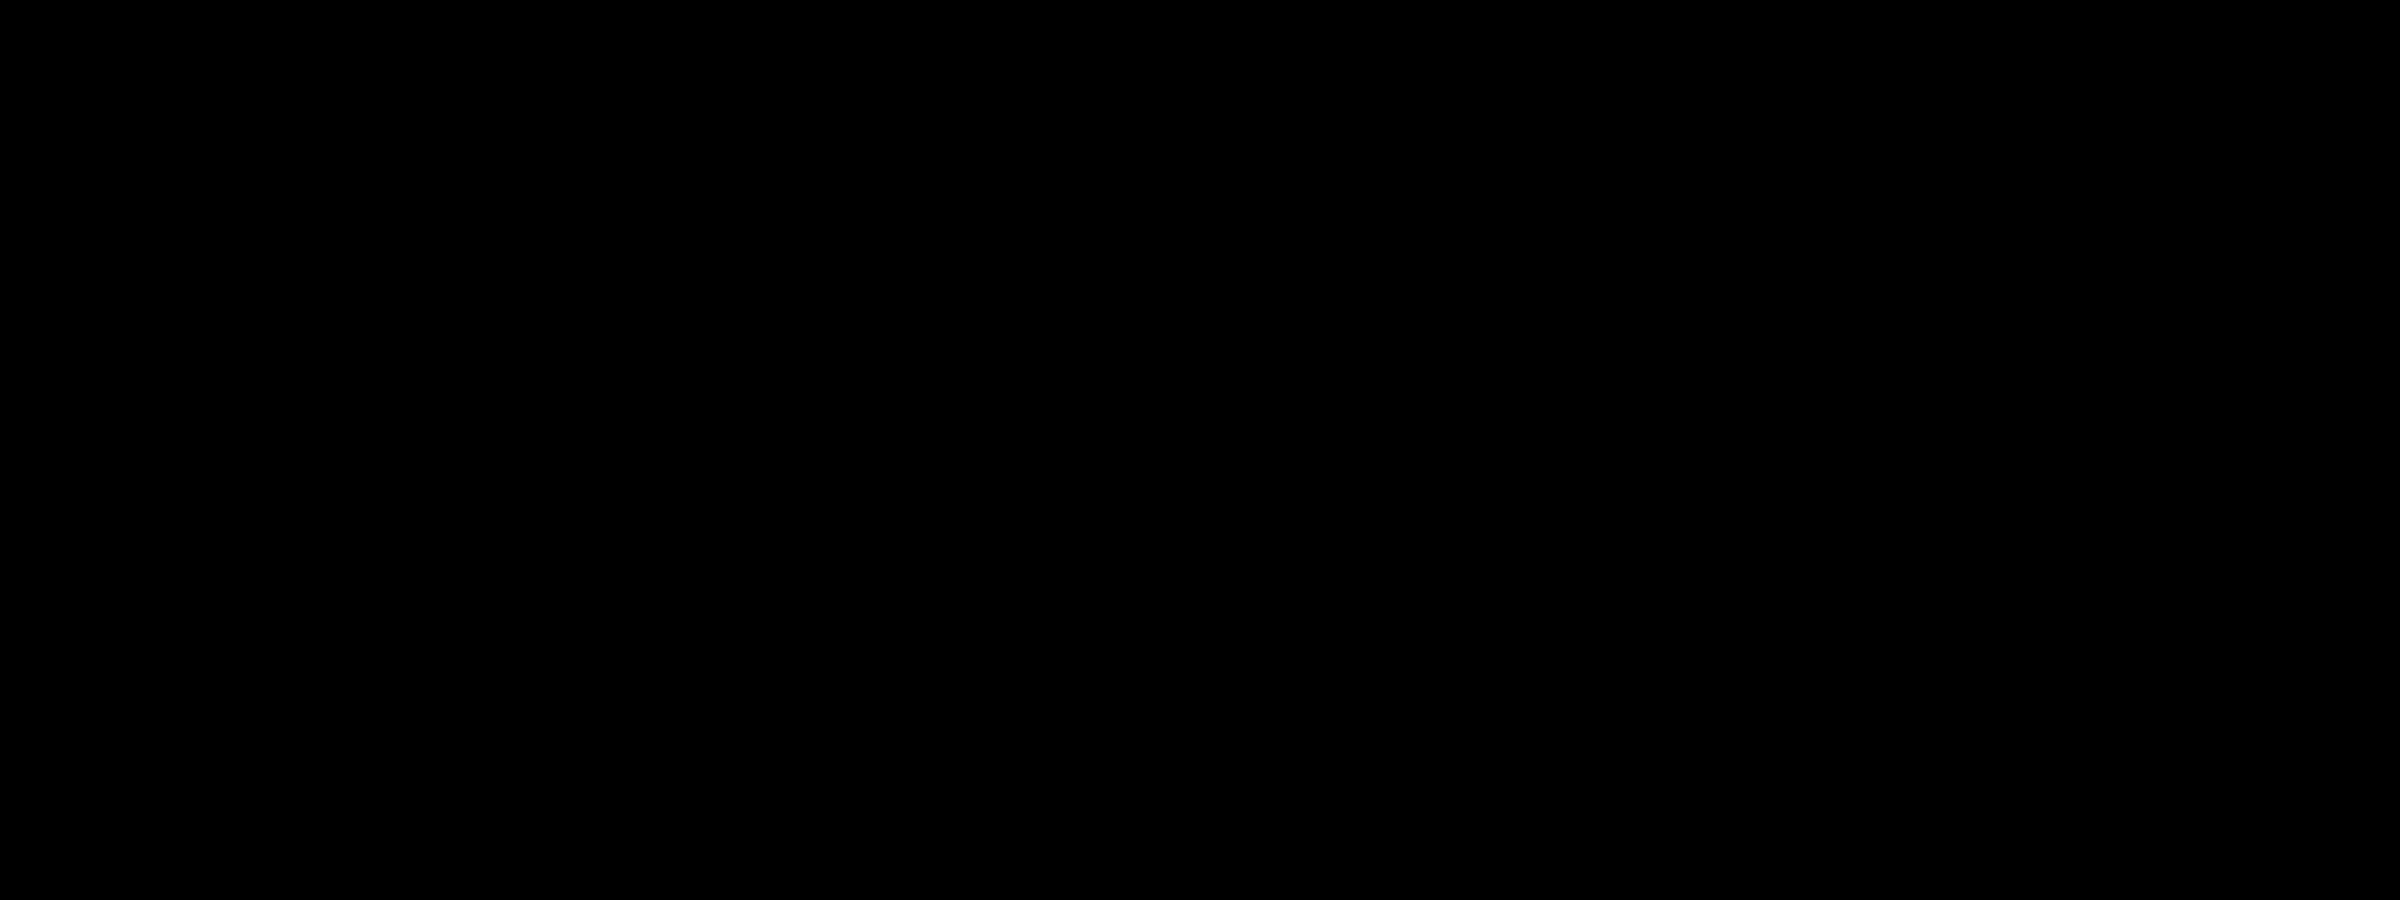 2400x900 Clipart Banner